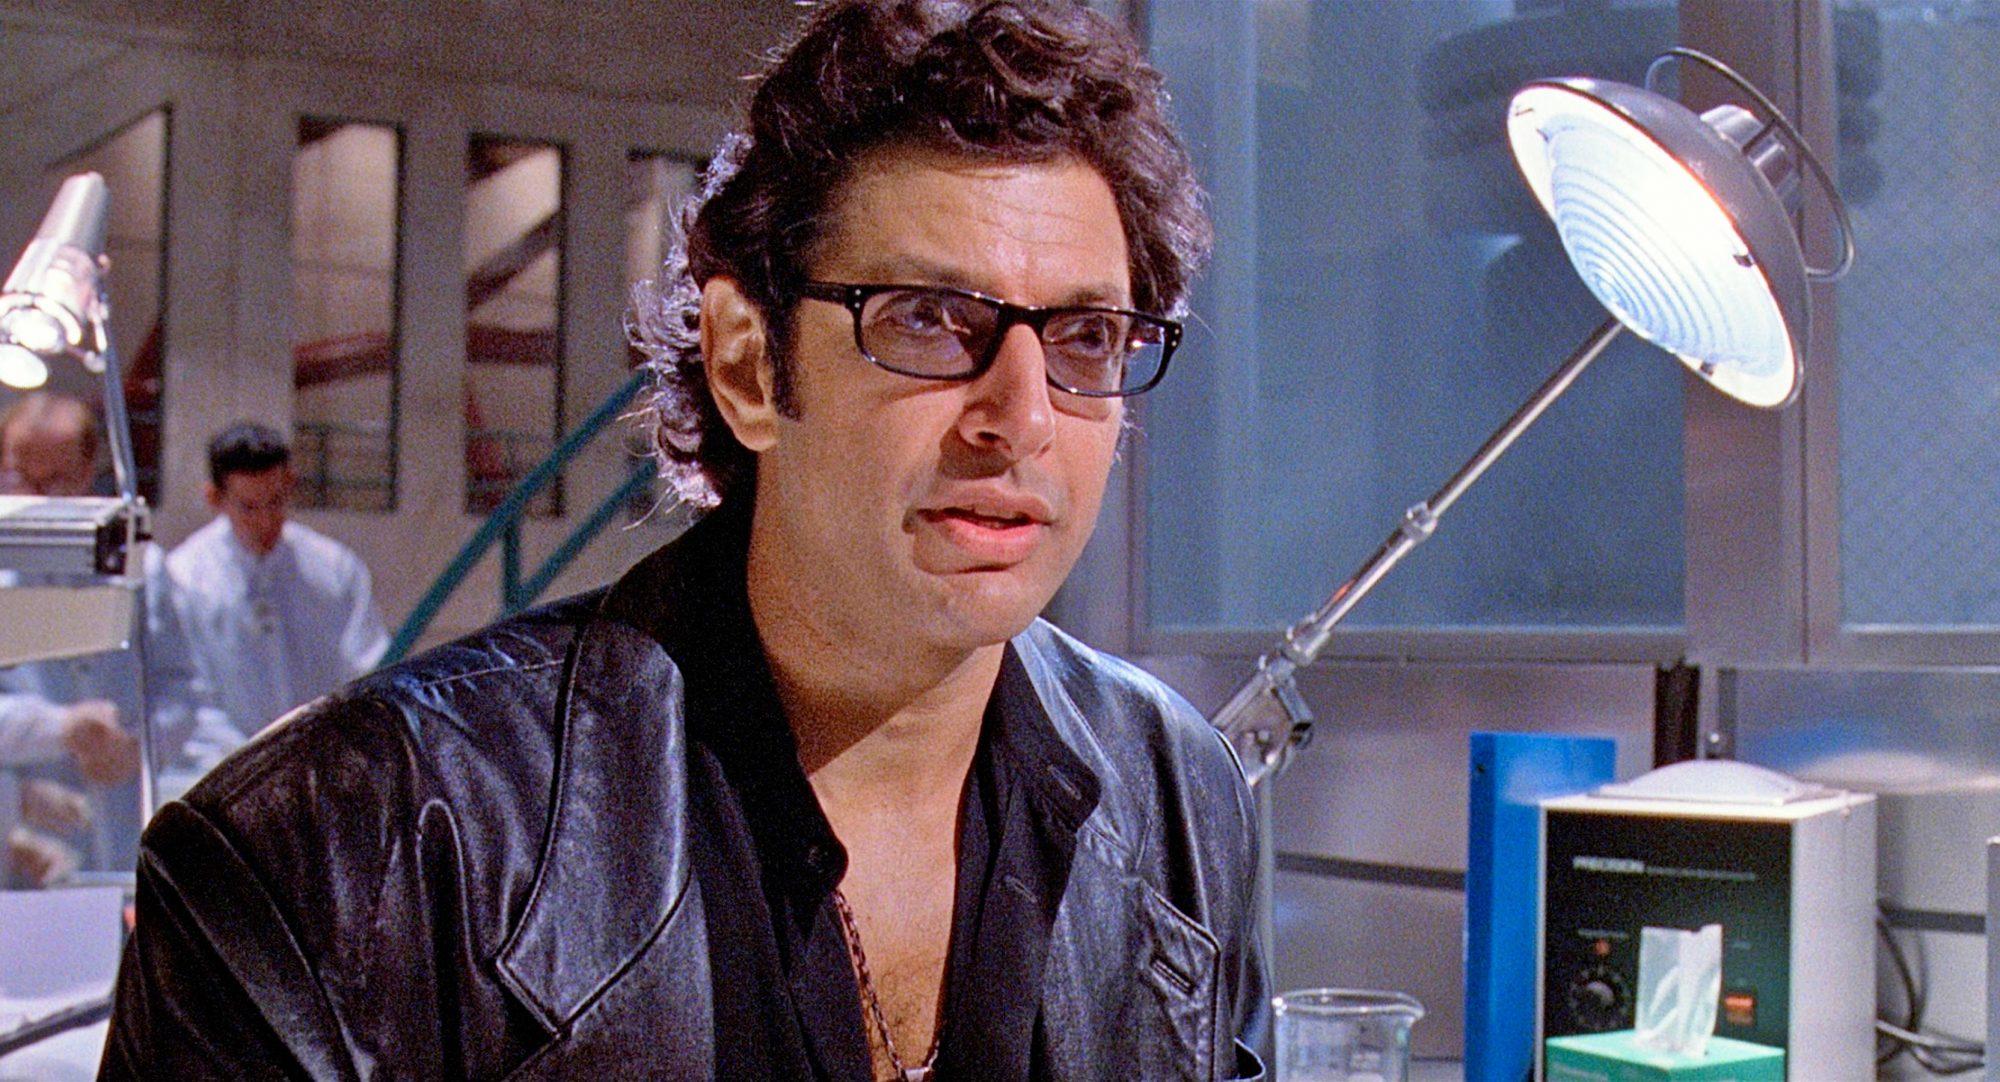 Jurassic Park (1993)Jeff Goldblum as Ian Malcolm